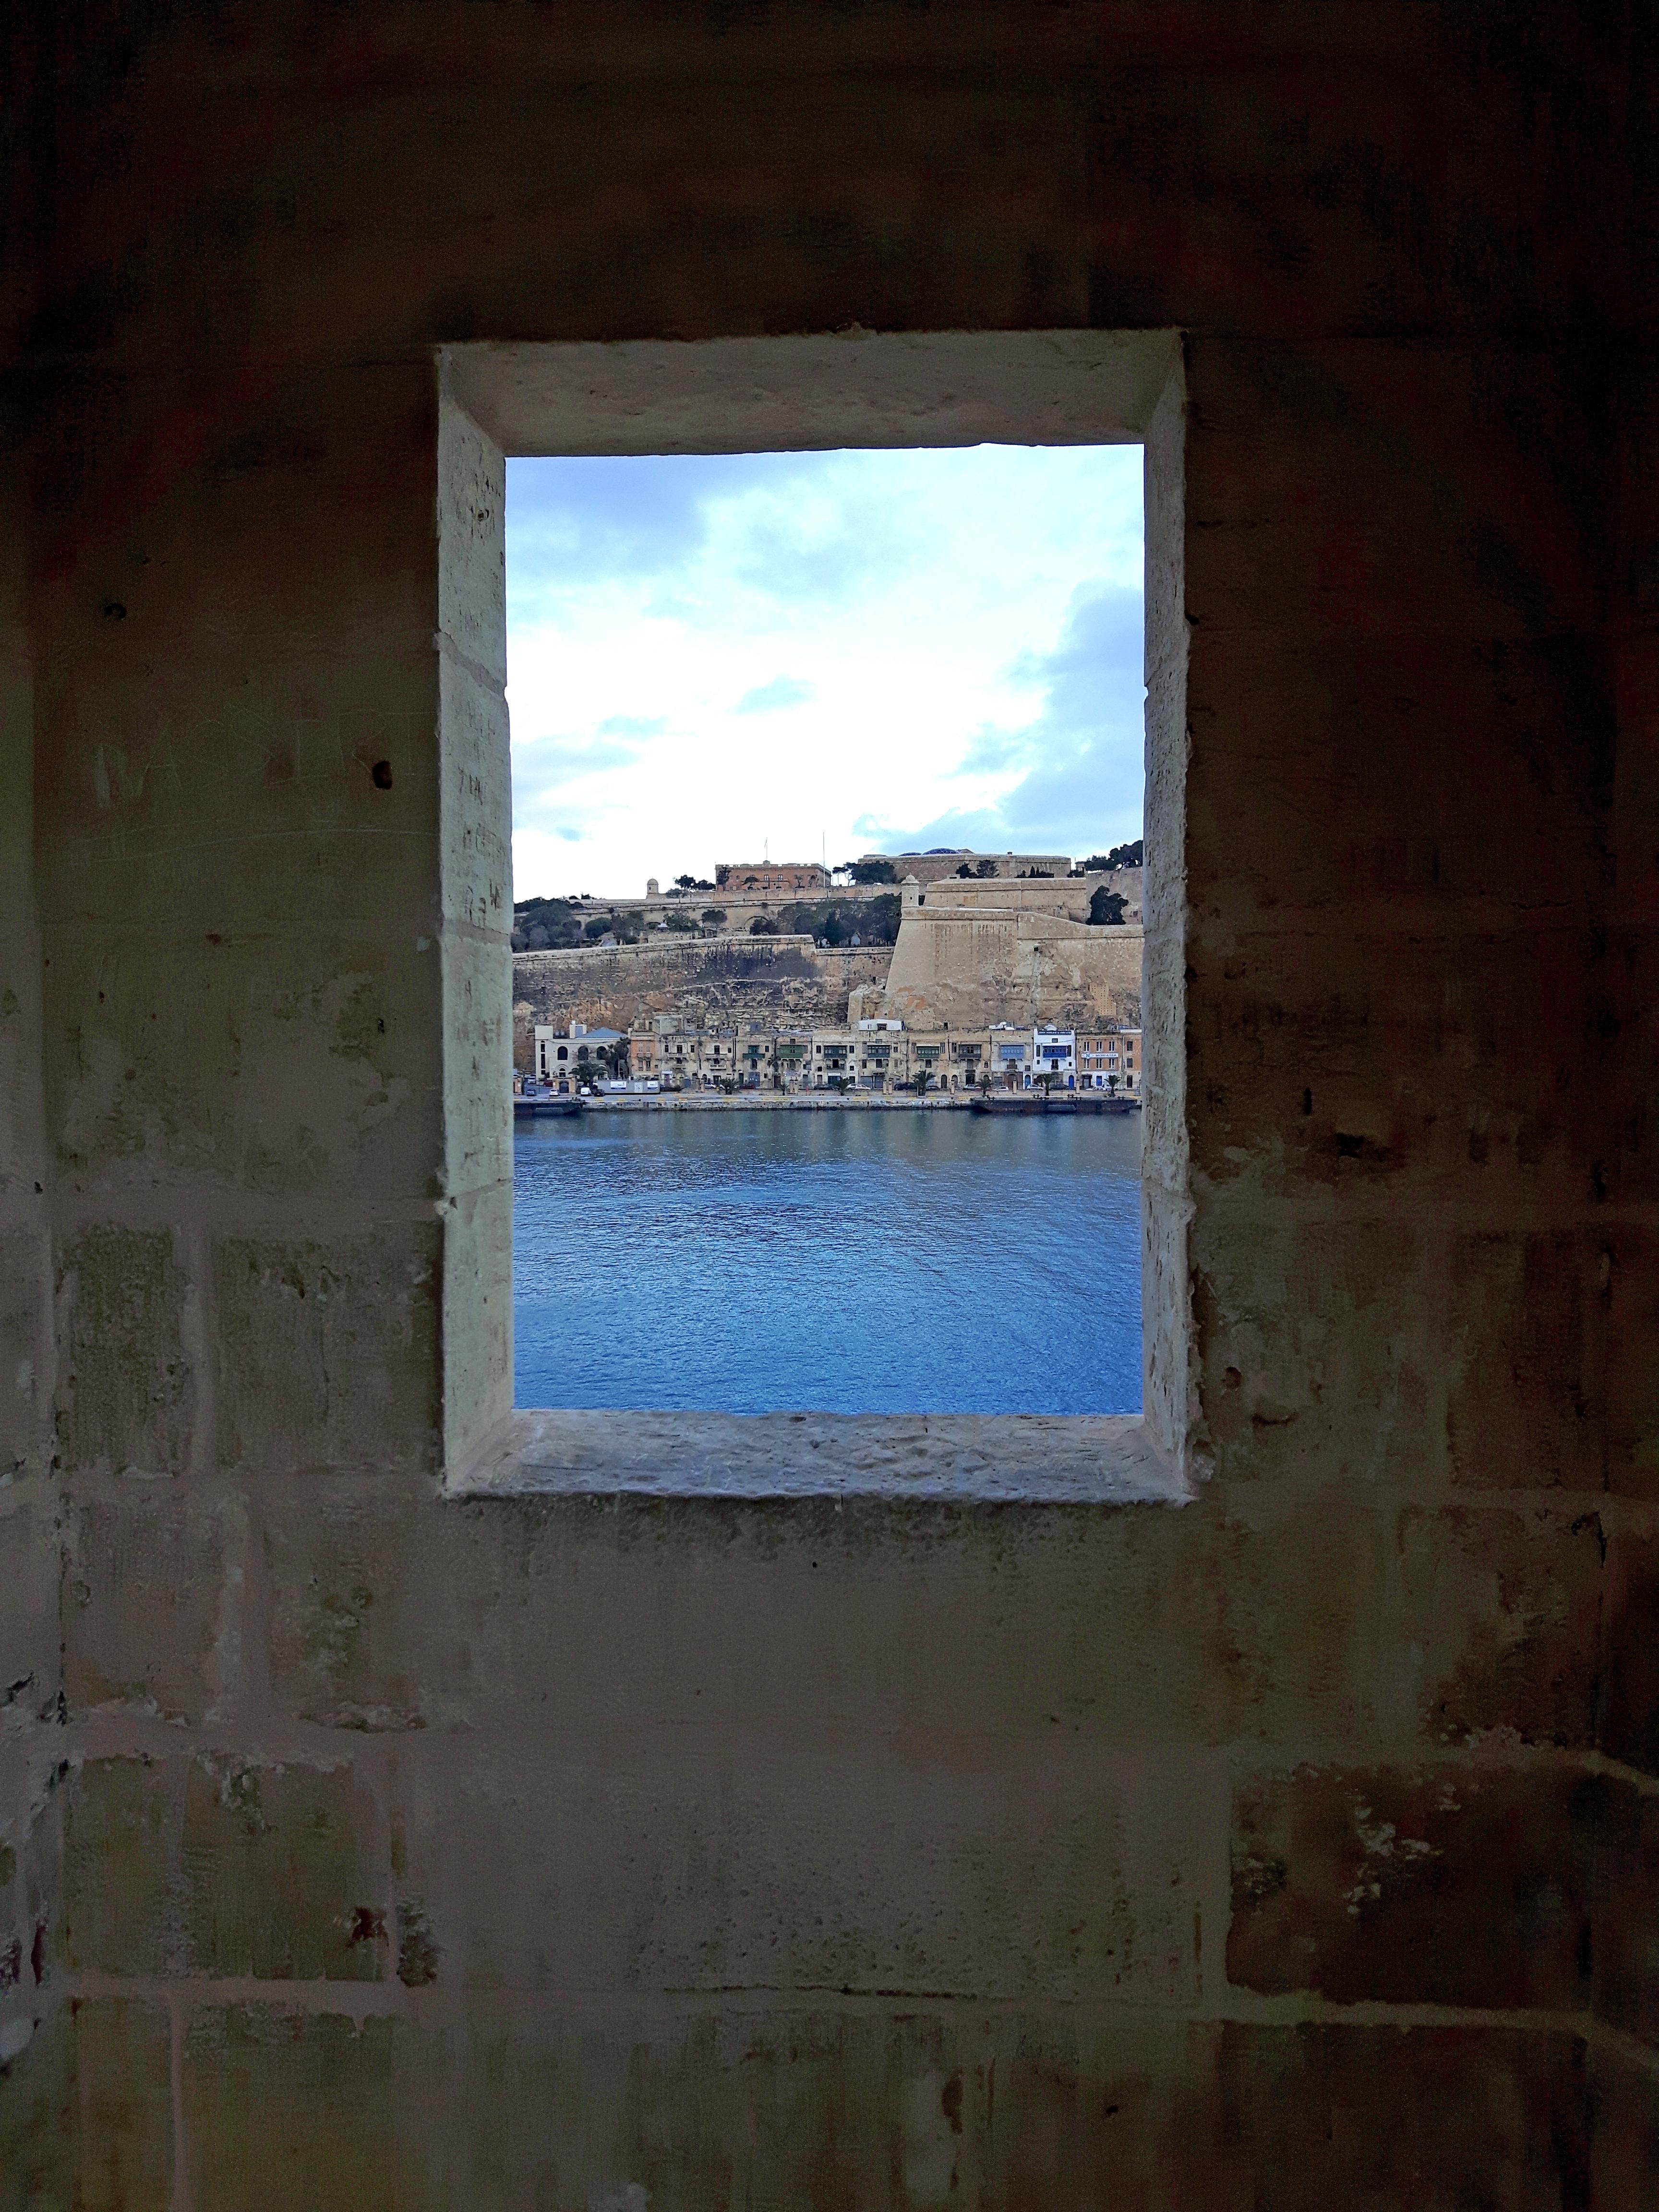 Senglea_The_Three_Cities_Malta